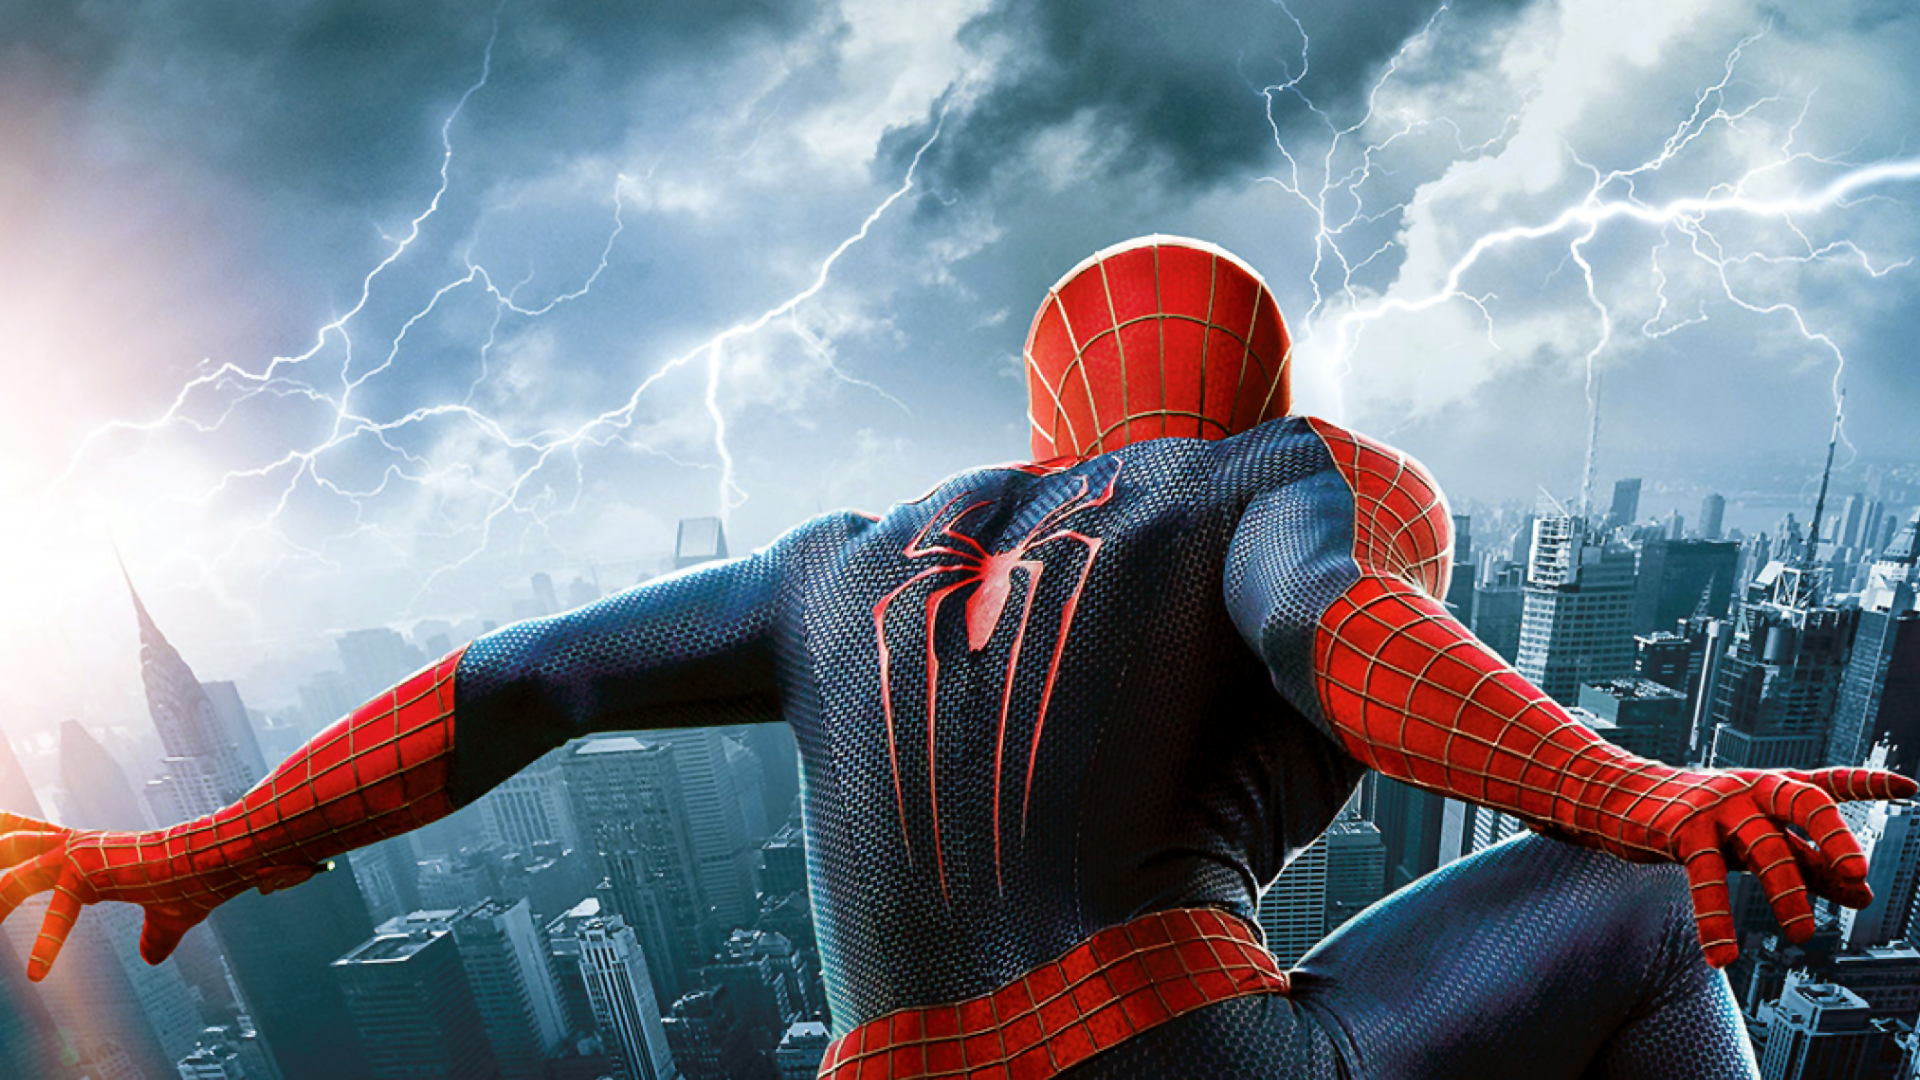 The Amazing Spider-Man 2 Wallpaper 2 by ProfessorAdagio